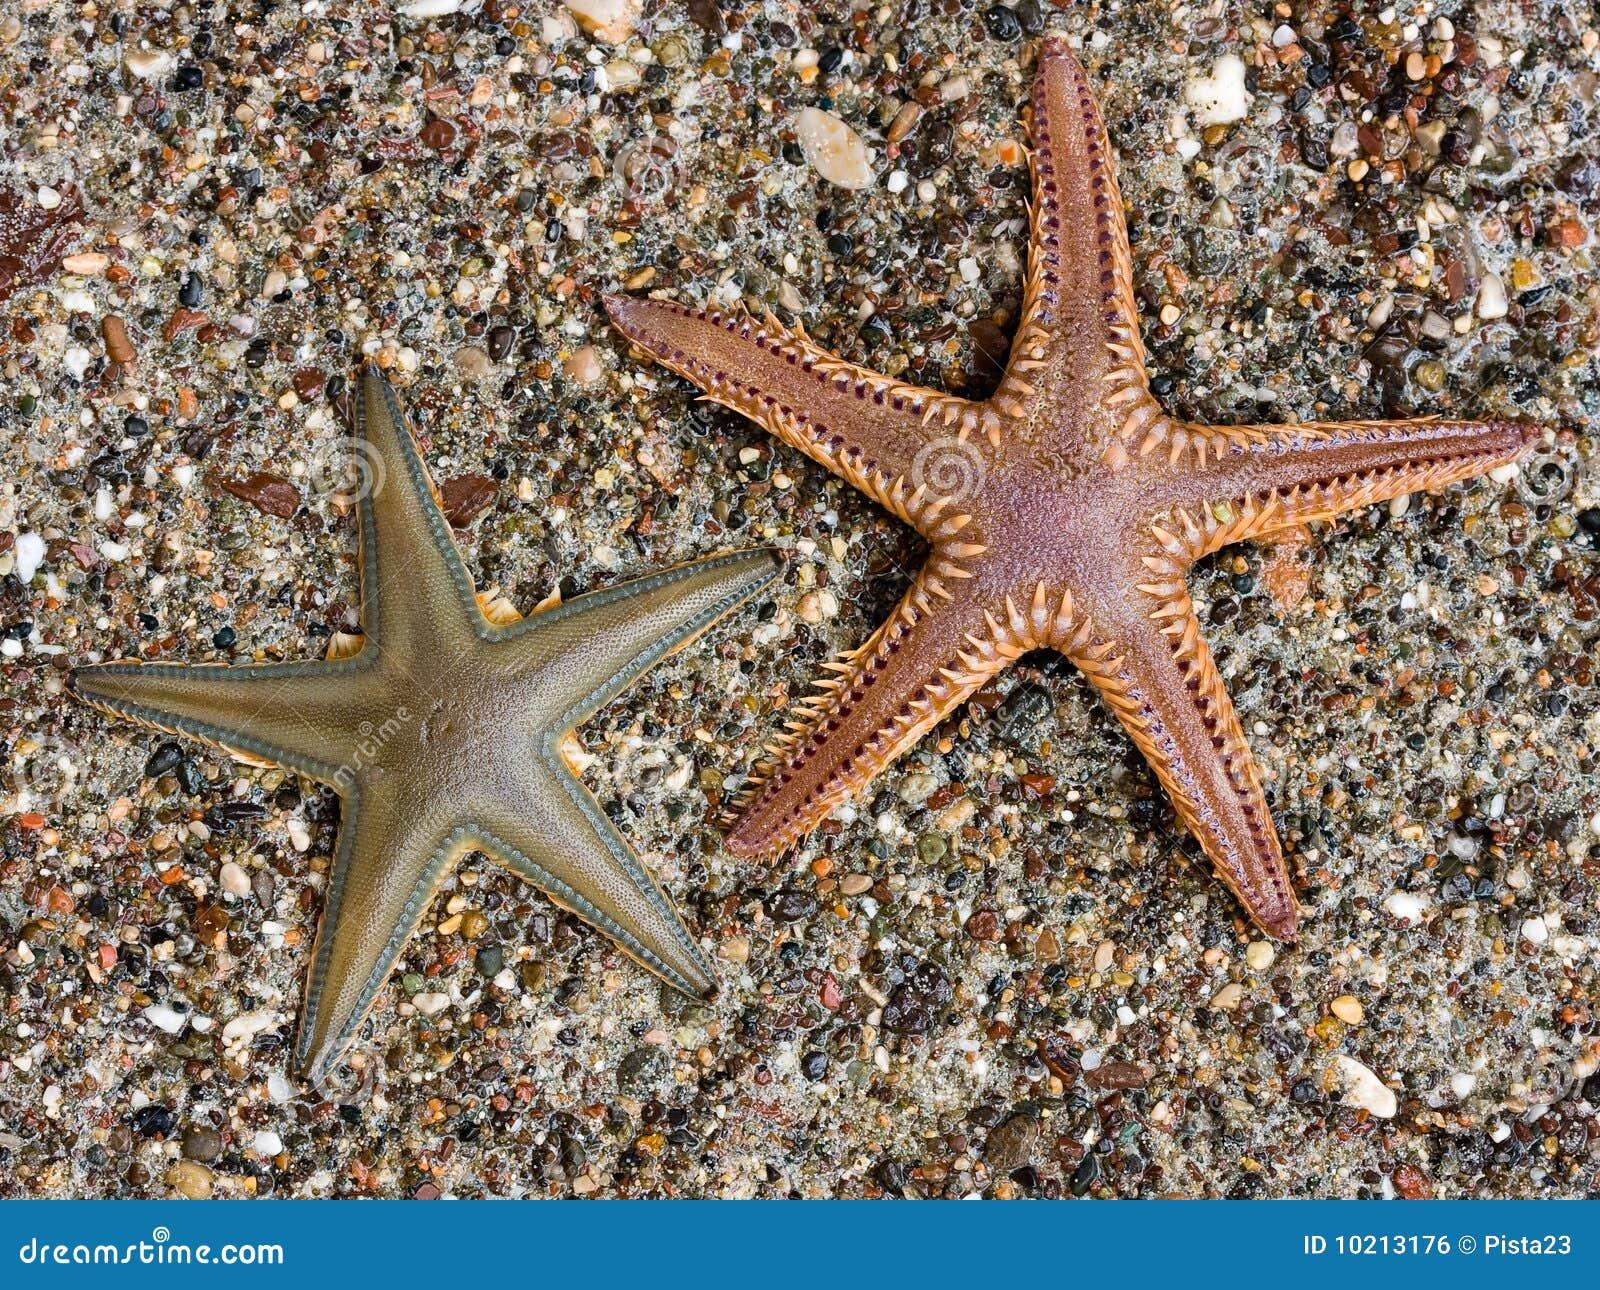 Sea Star Royalty Free Stock Image Image